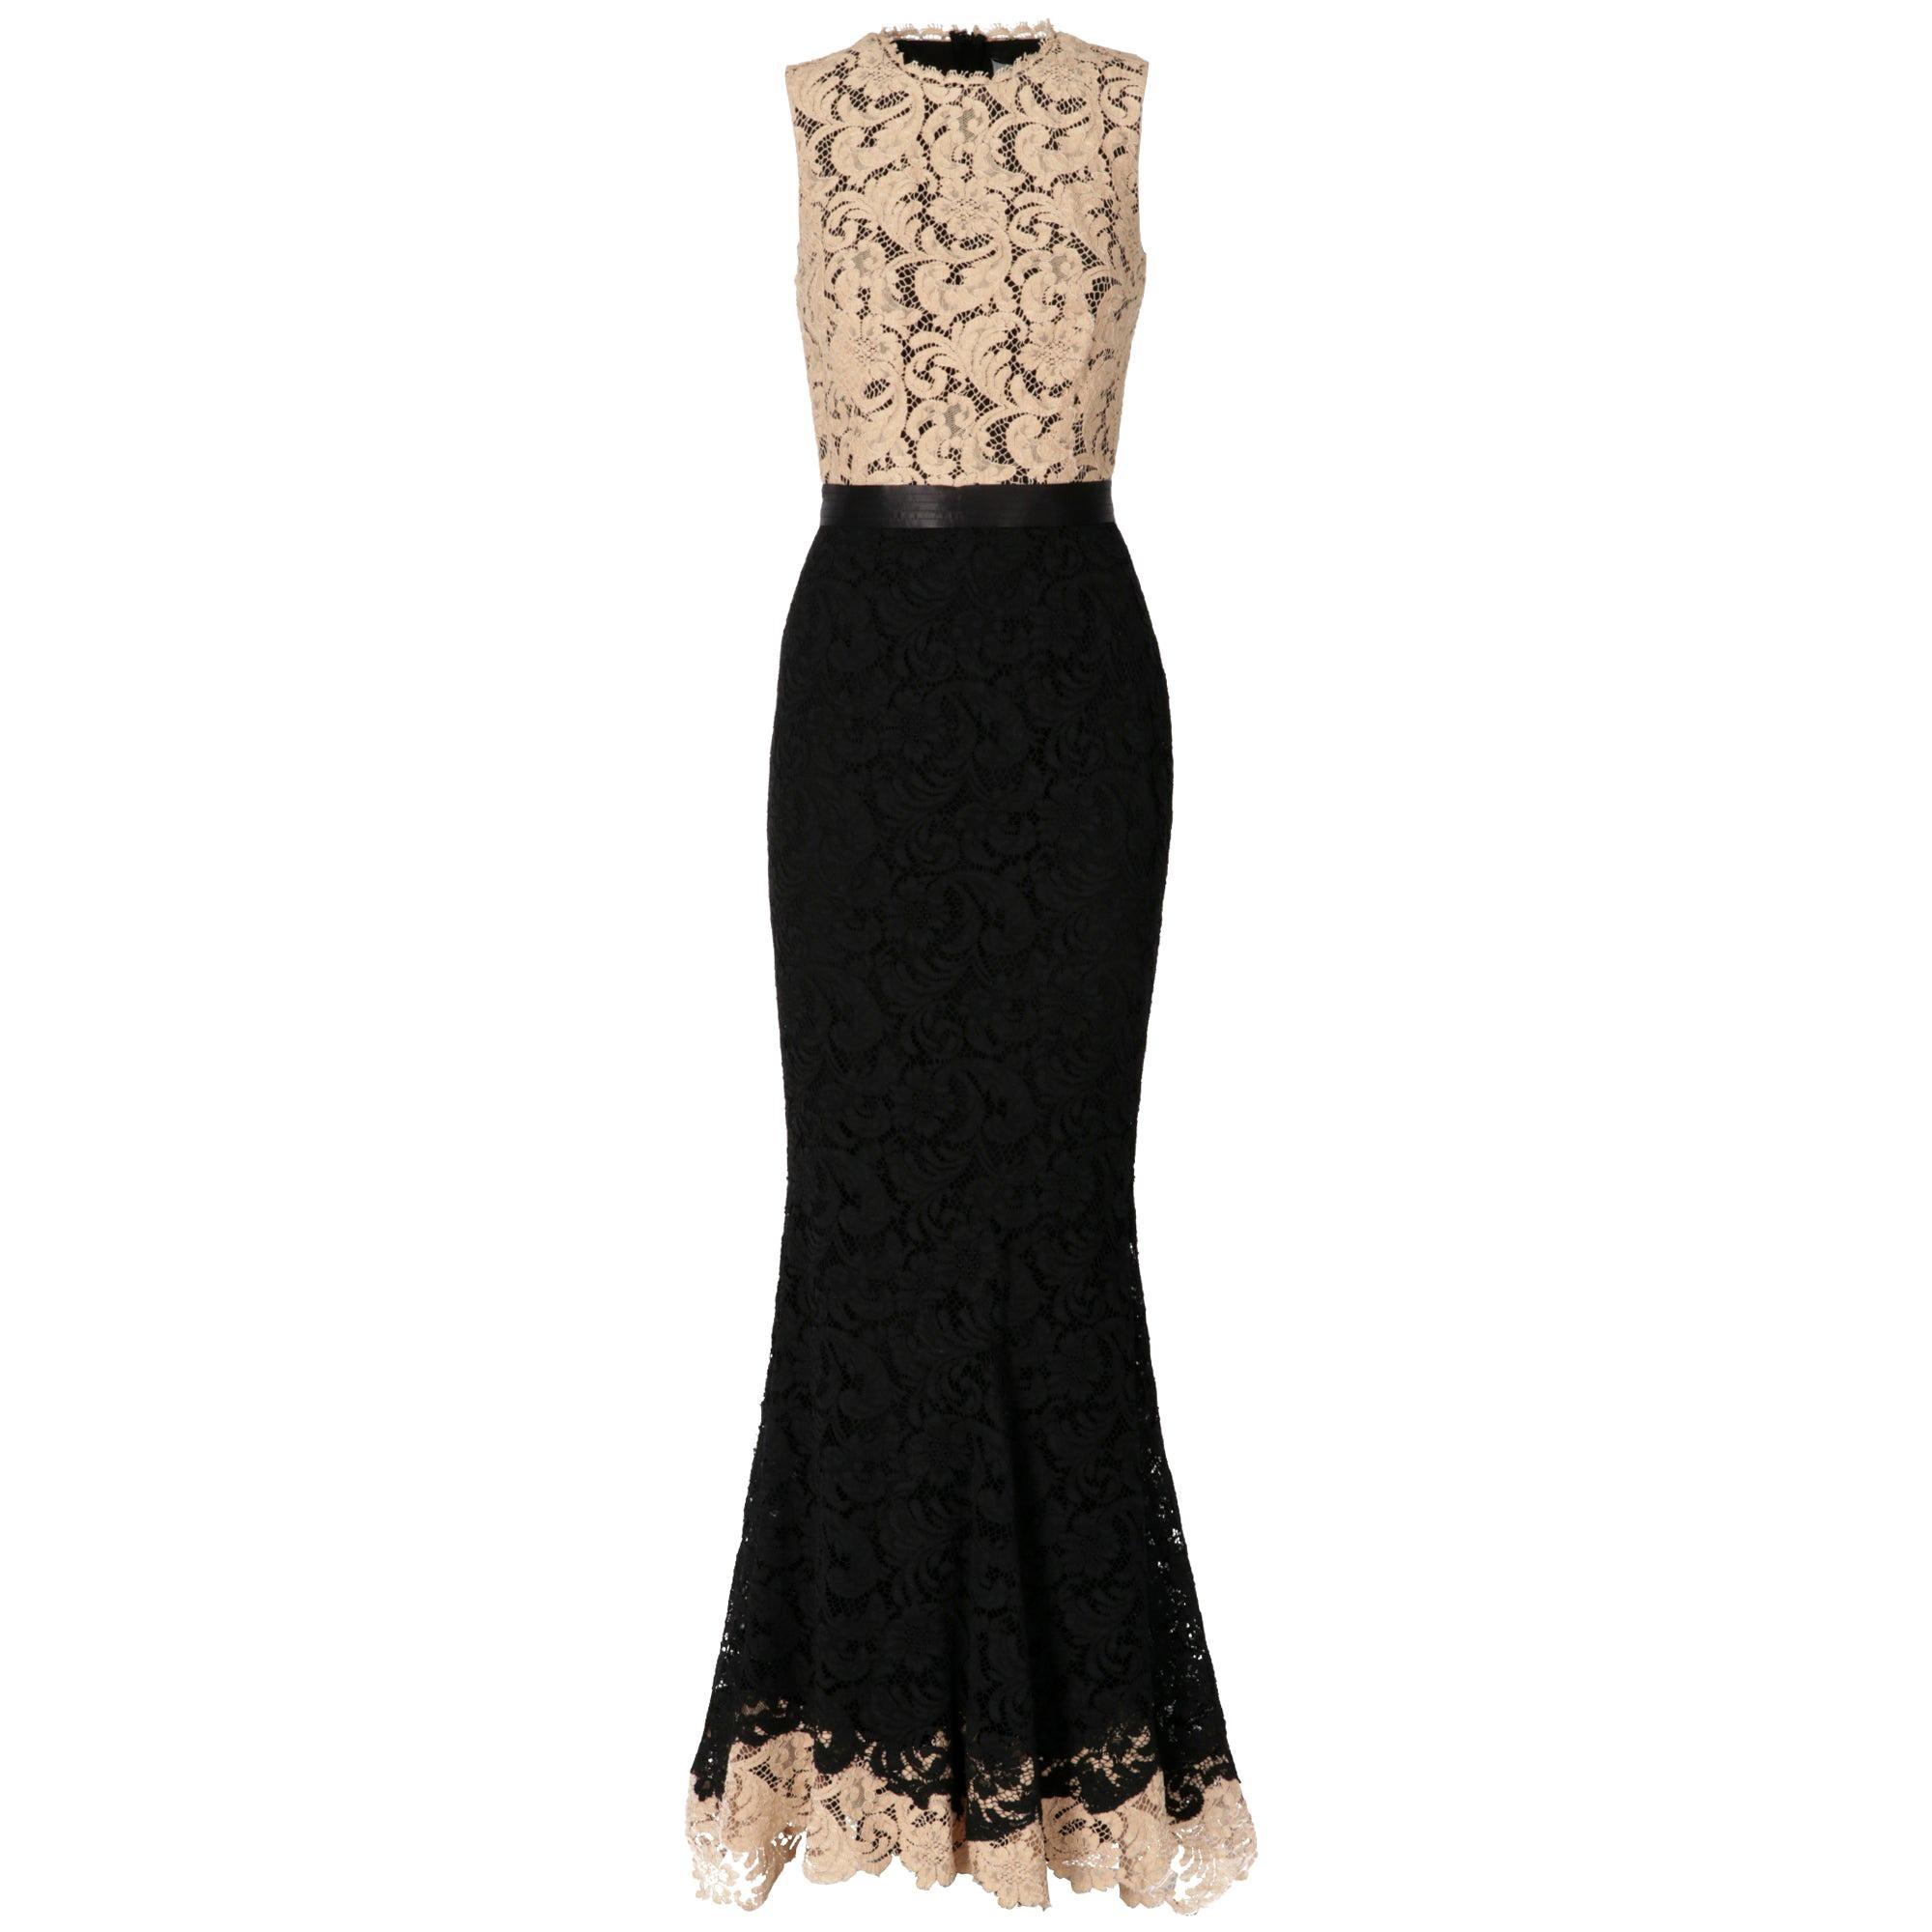 2000s Zuhair Murad Black Lace Mermaid Dress